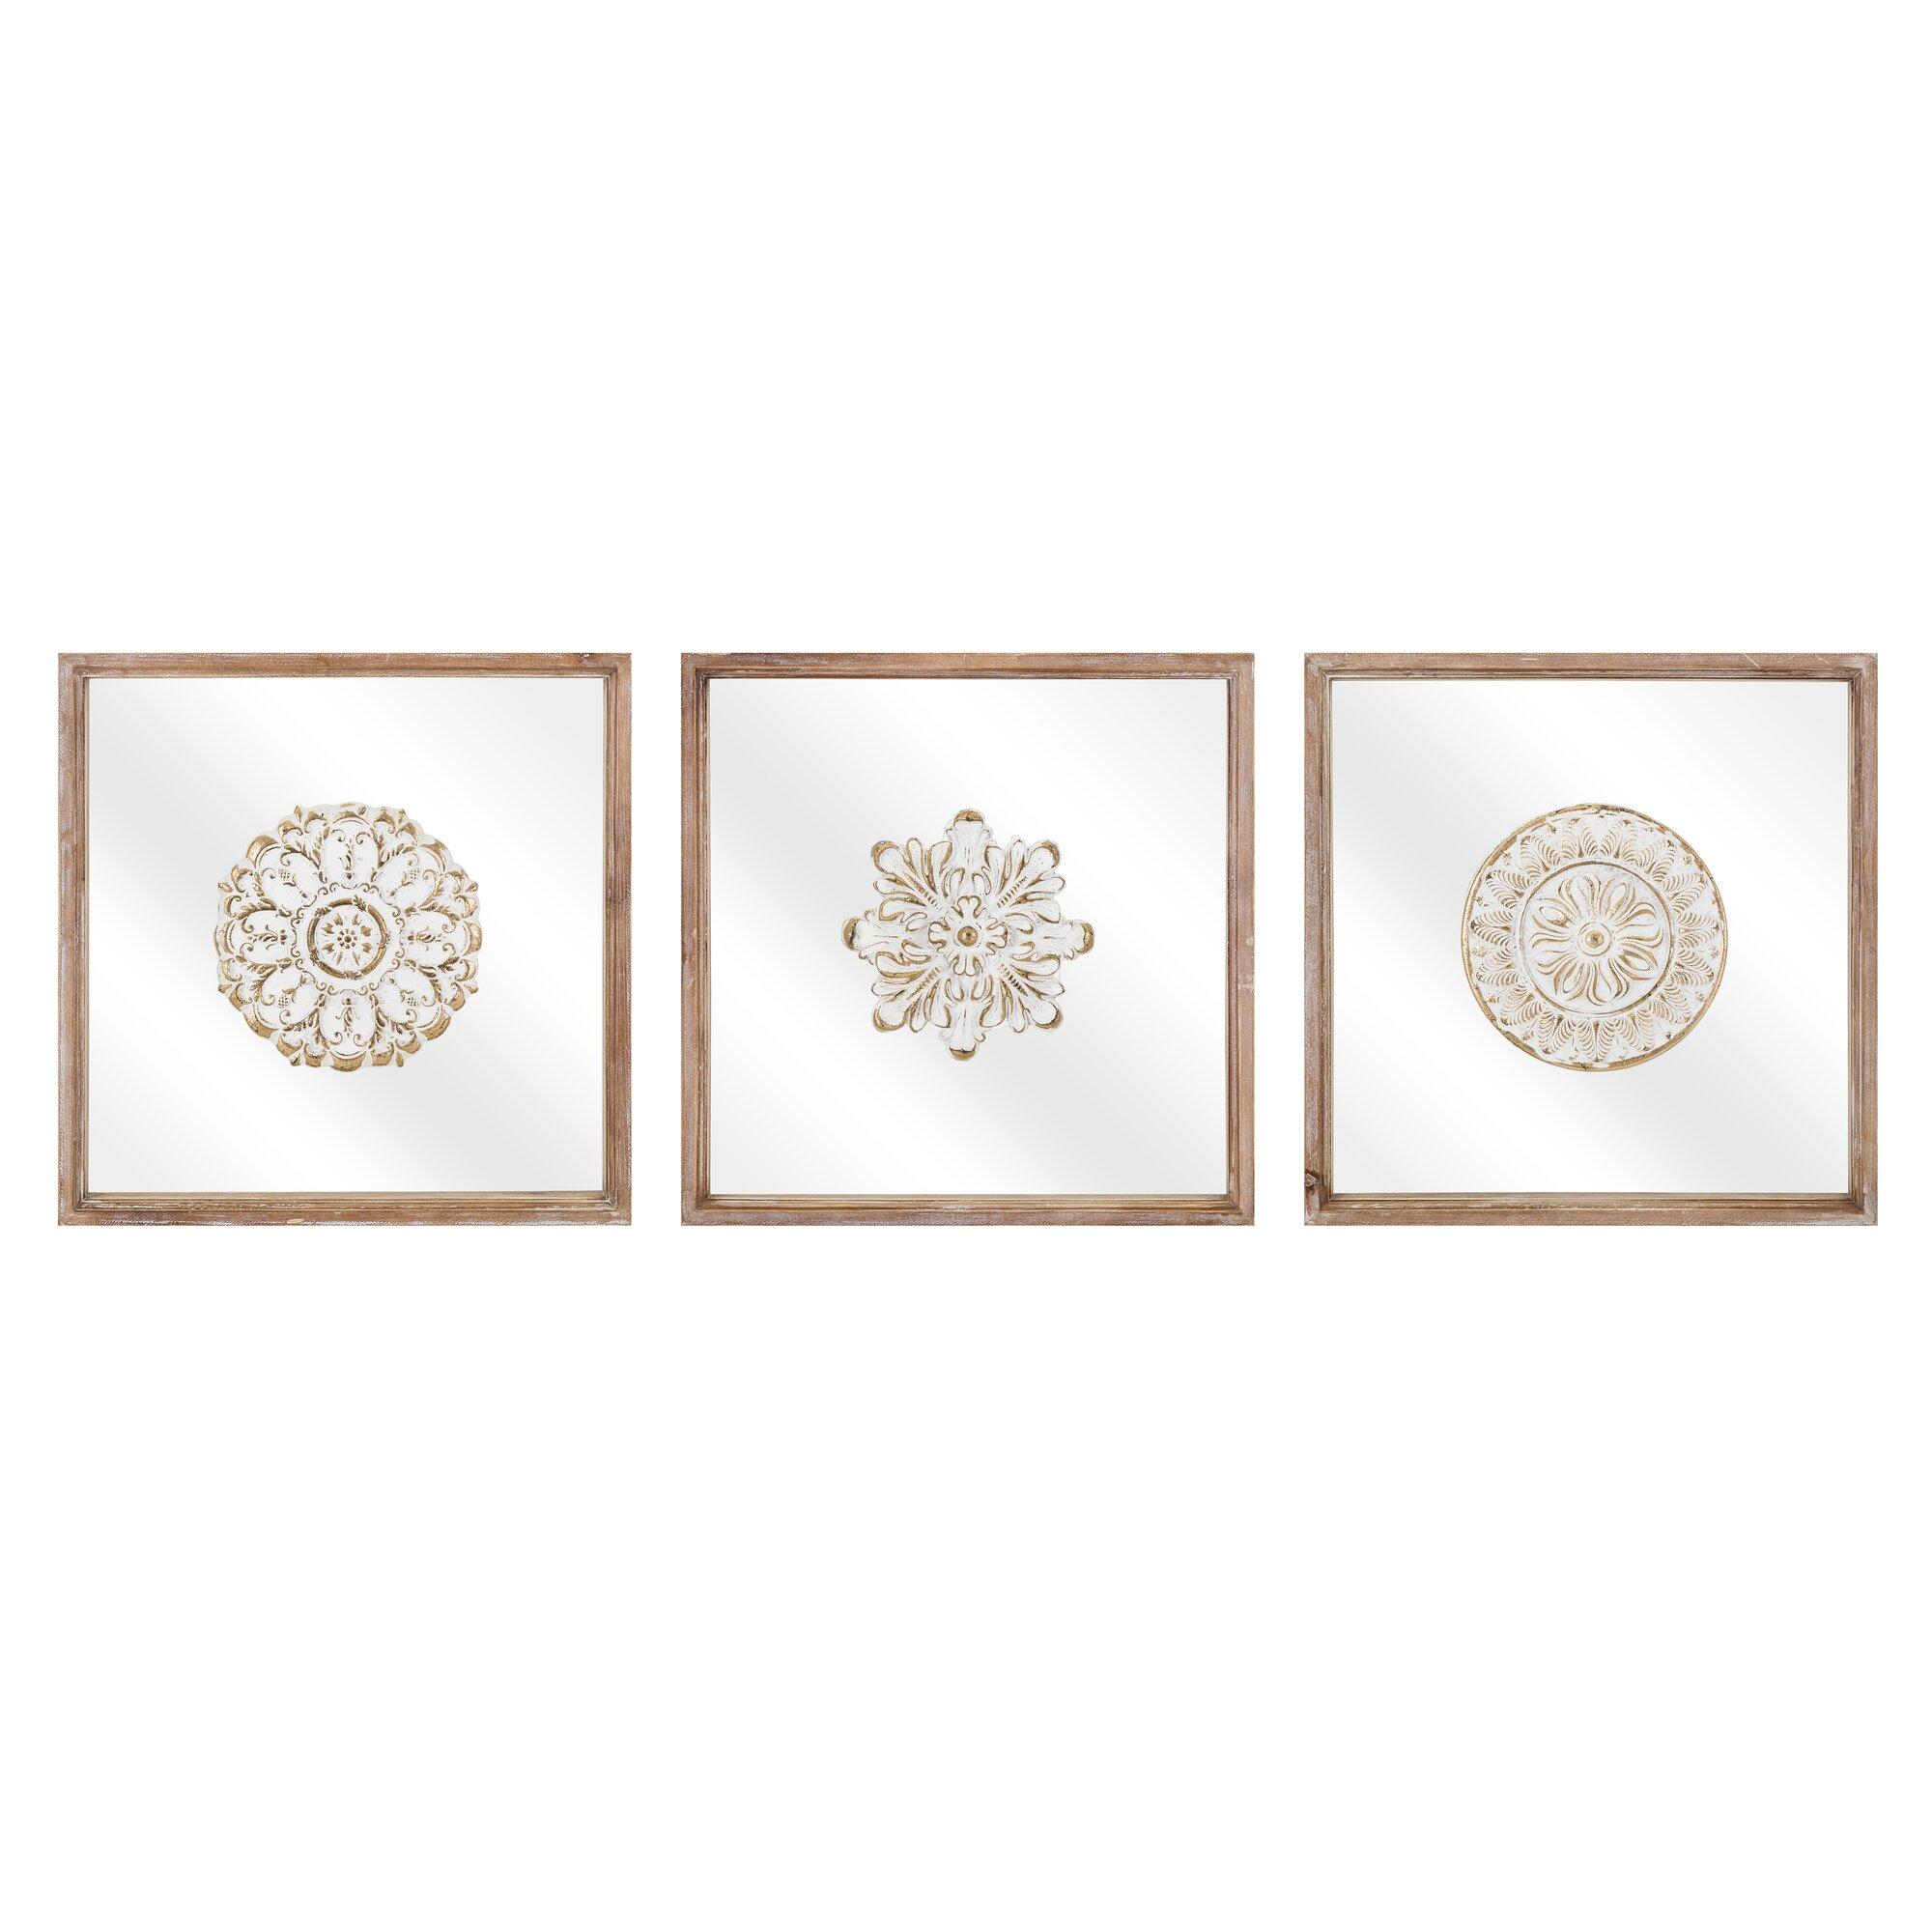 3 Piece Utensil Wall Décor Set : Bungalow rose piece glass wall decor set reviews